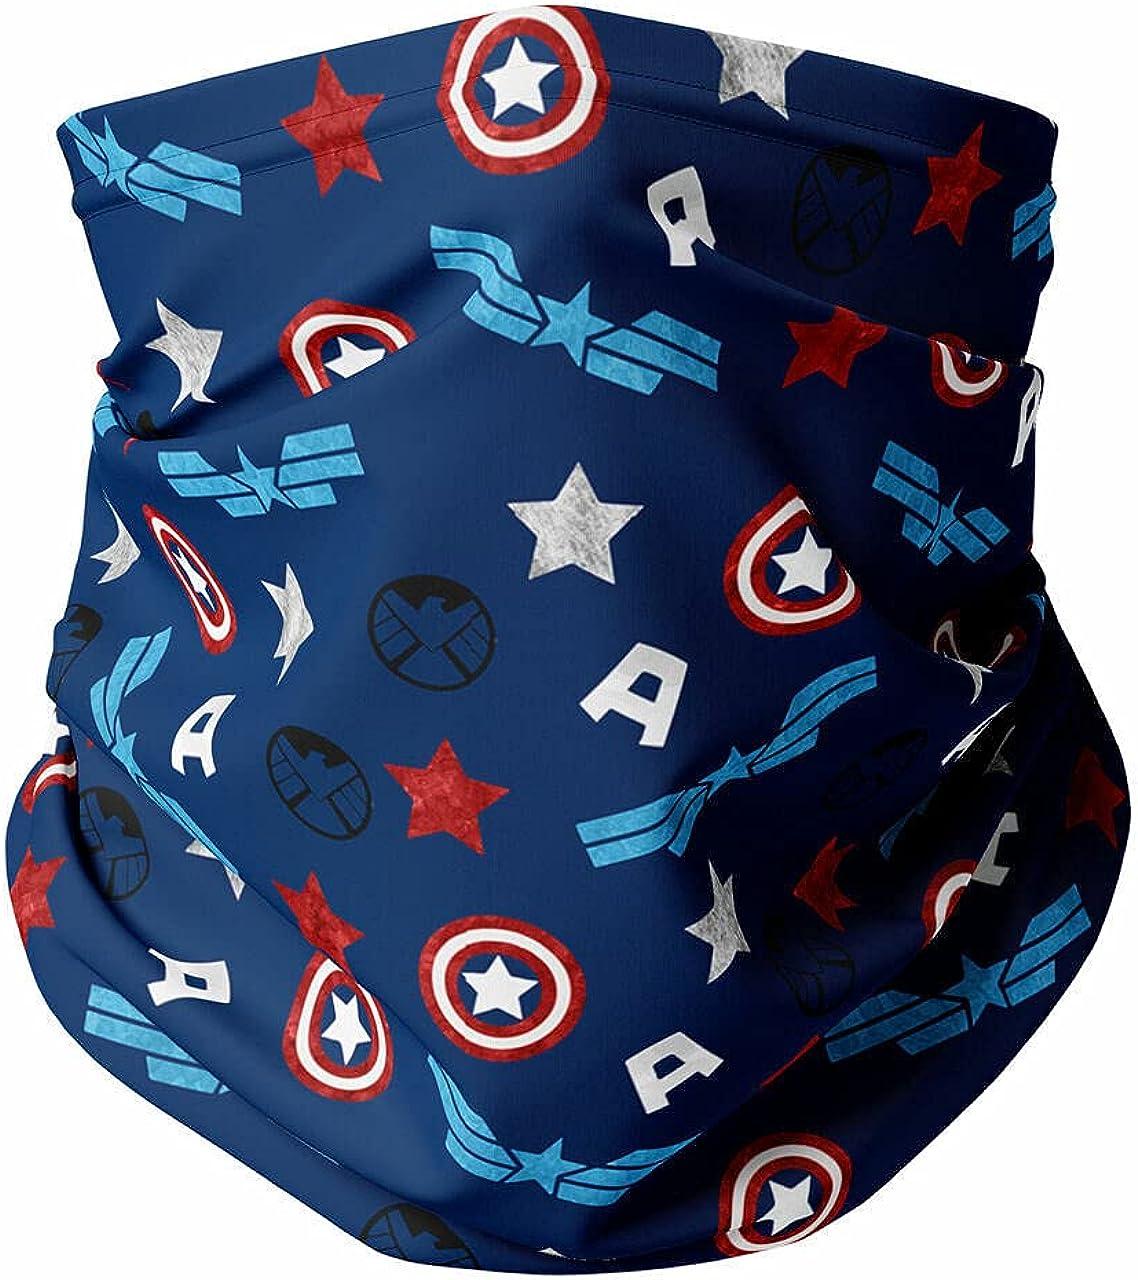 Neck Gaiter Face Covering - American Superhero